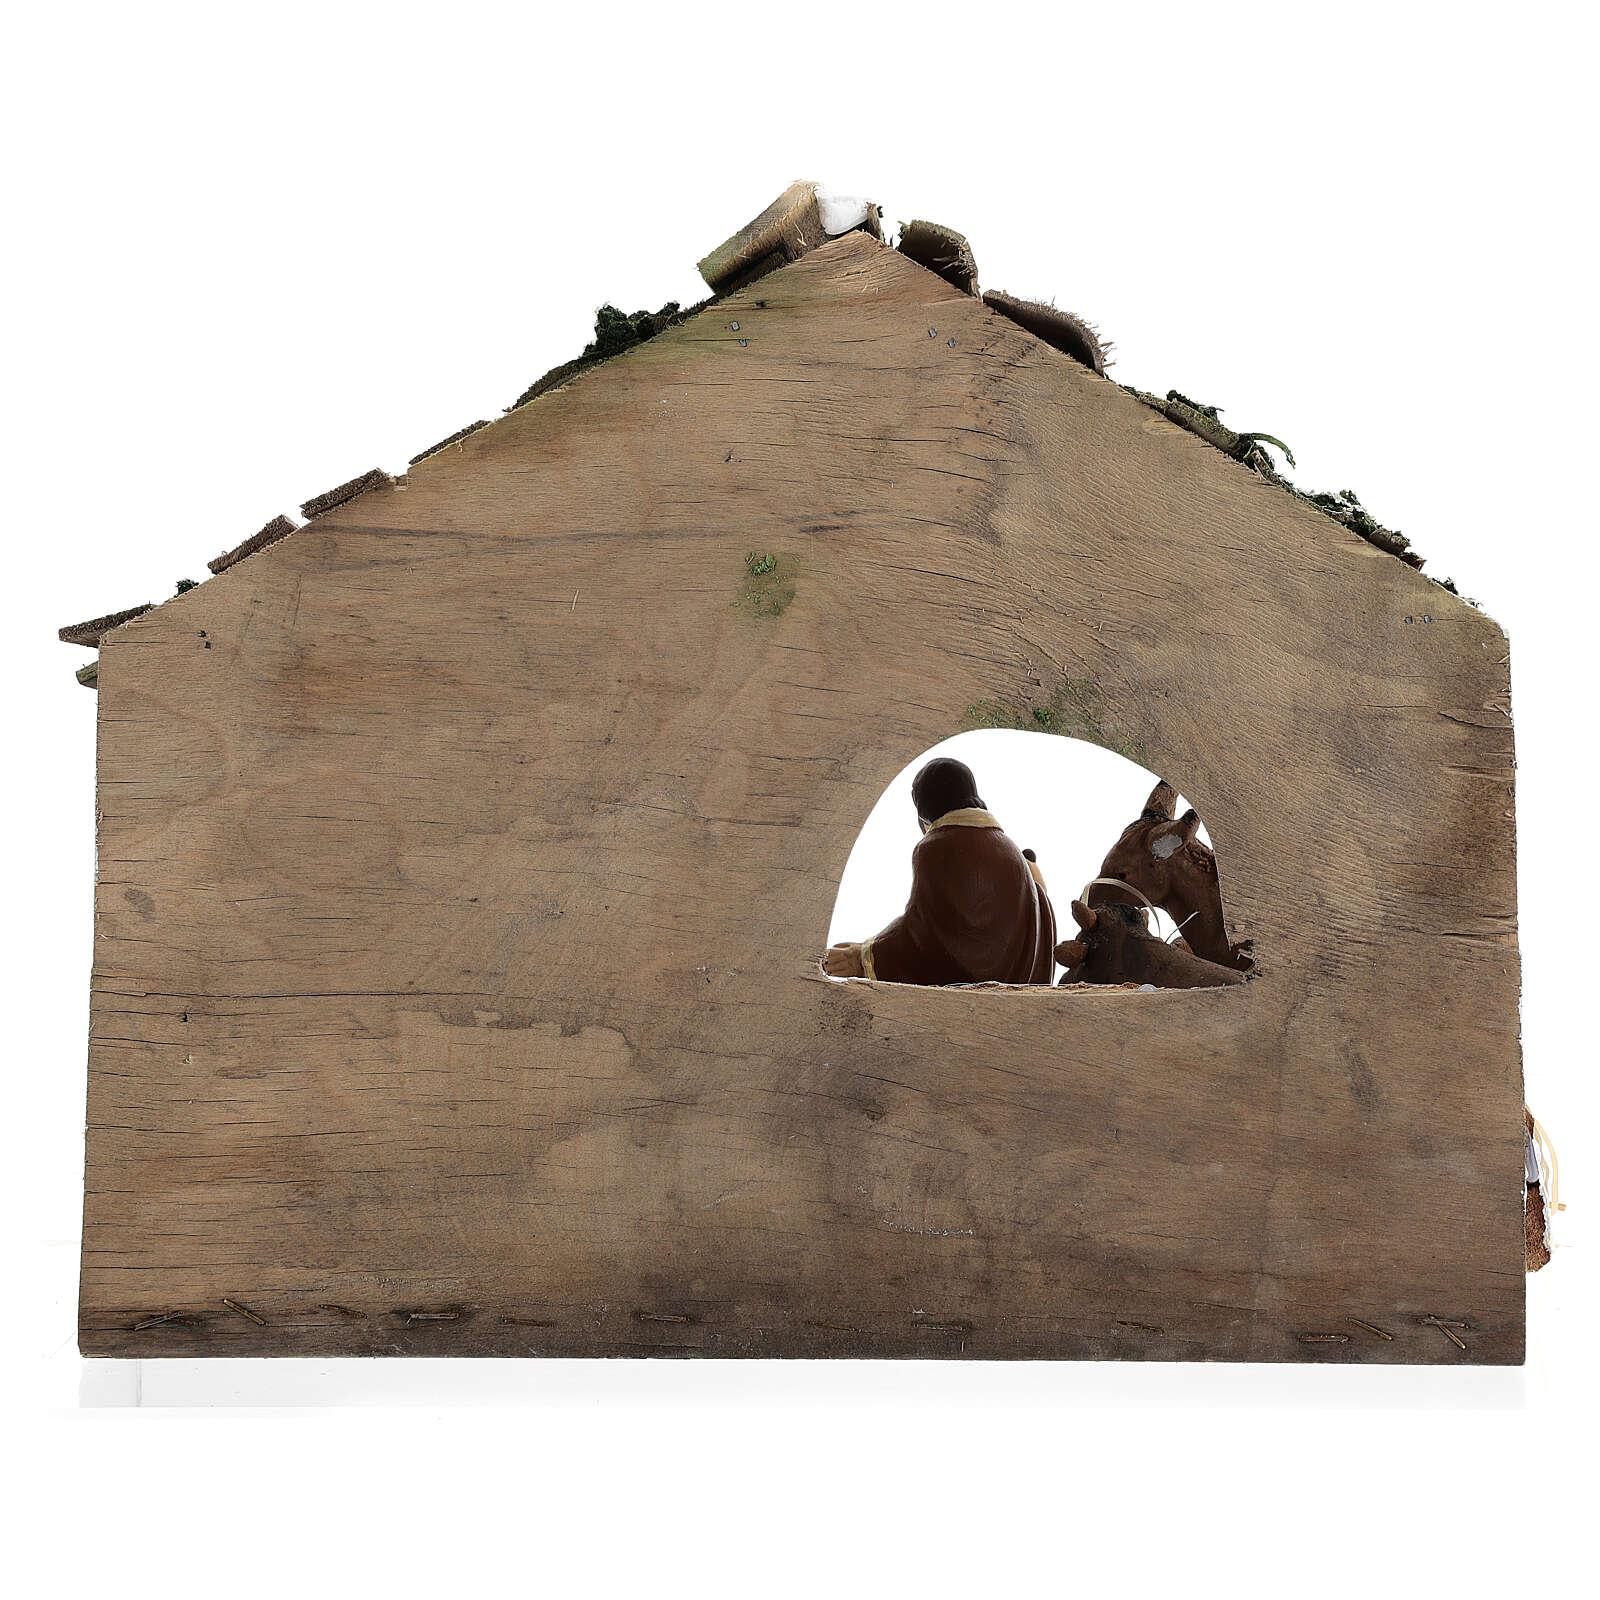 Wooden hut statues painted terracotta 12 cm Deruta 30x35x20 cm 4